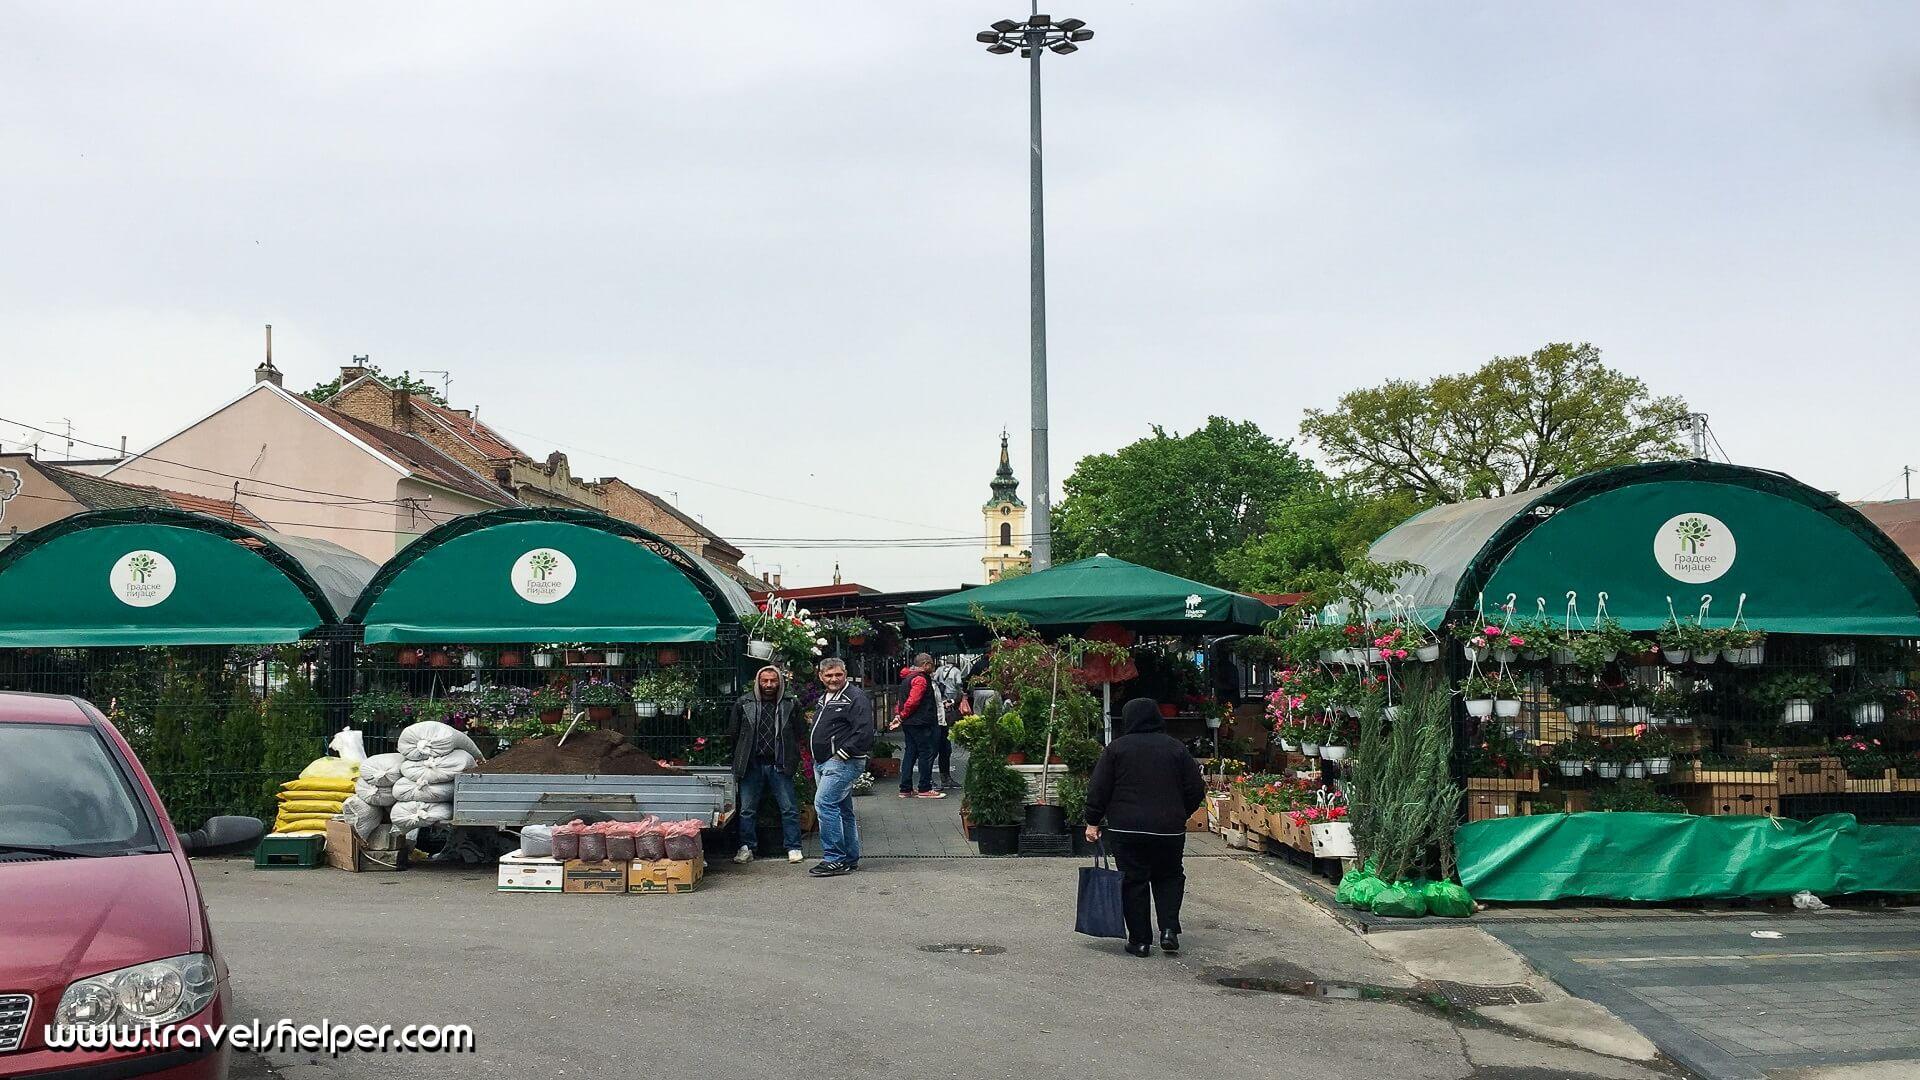 Green Wreath, Belgrade